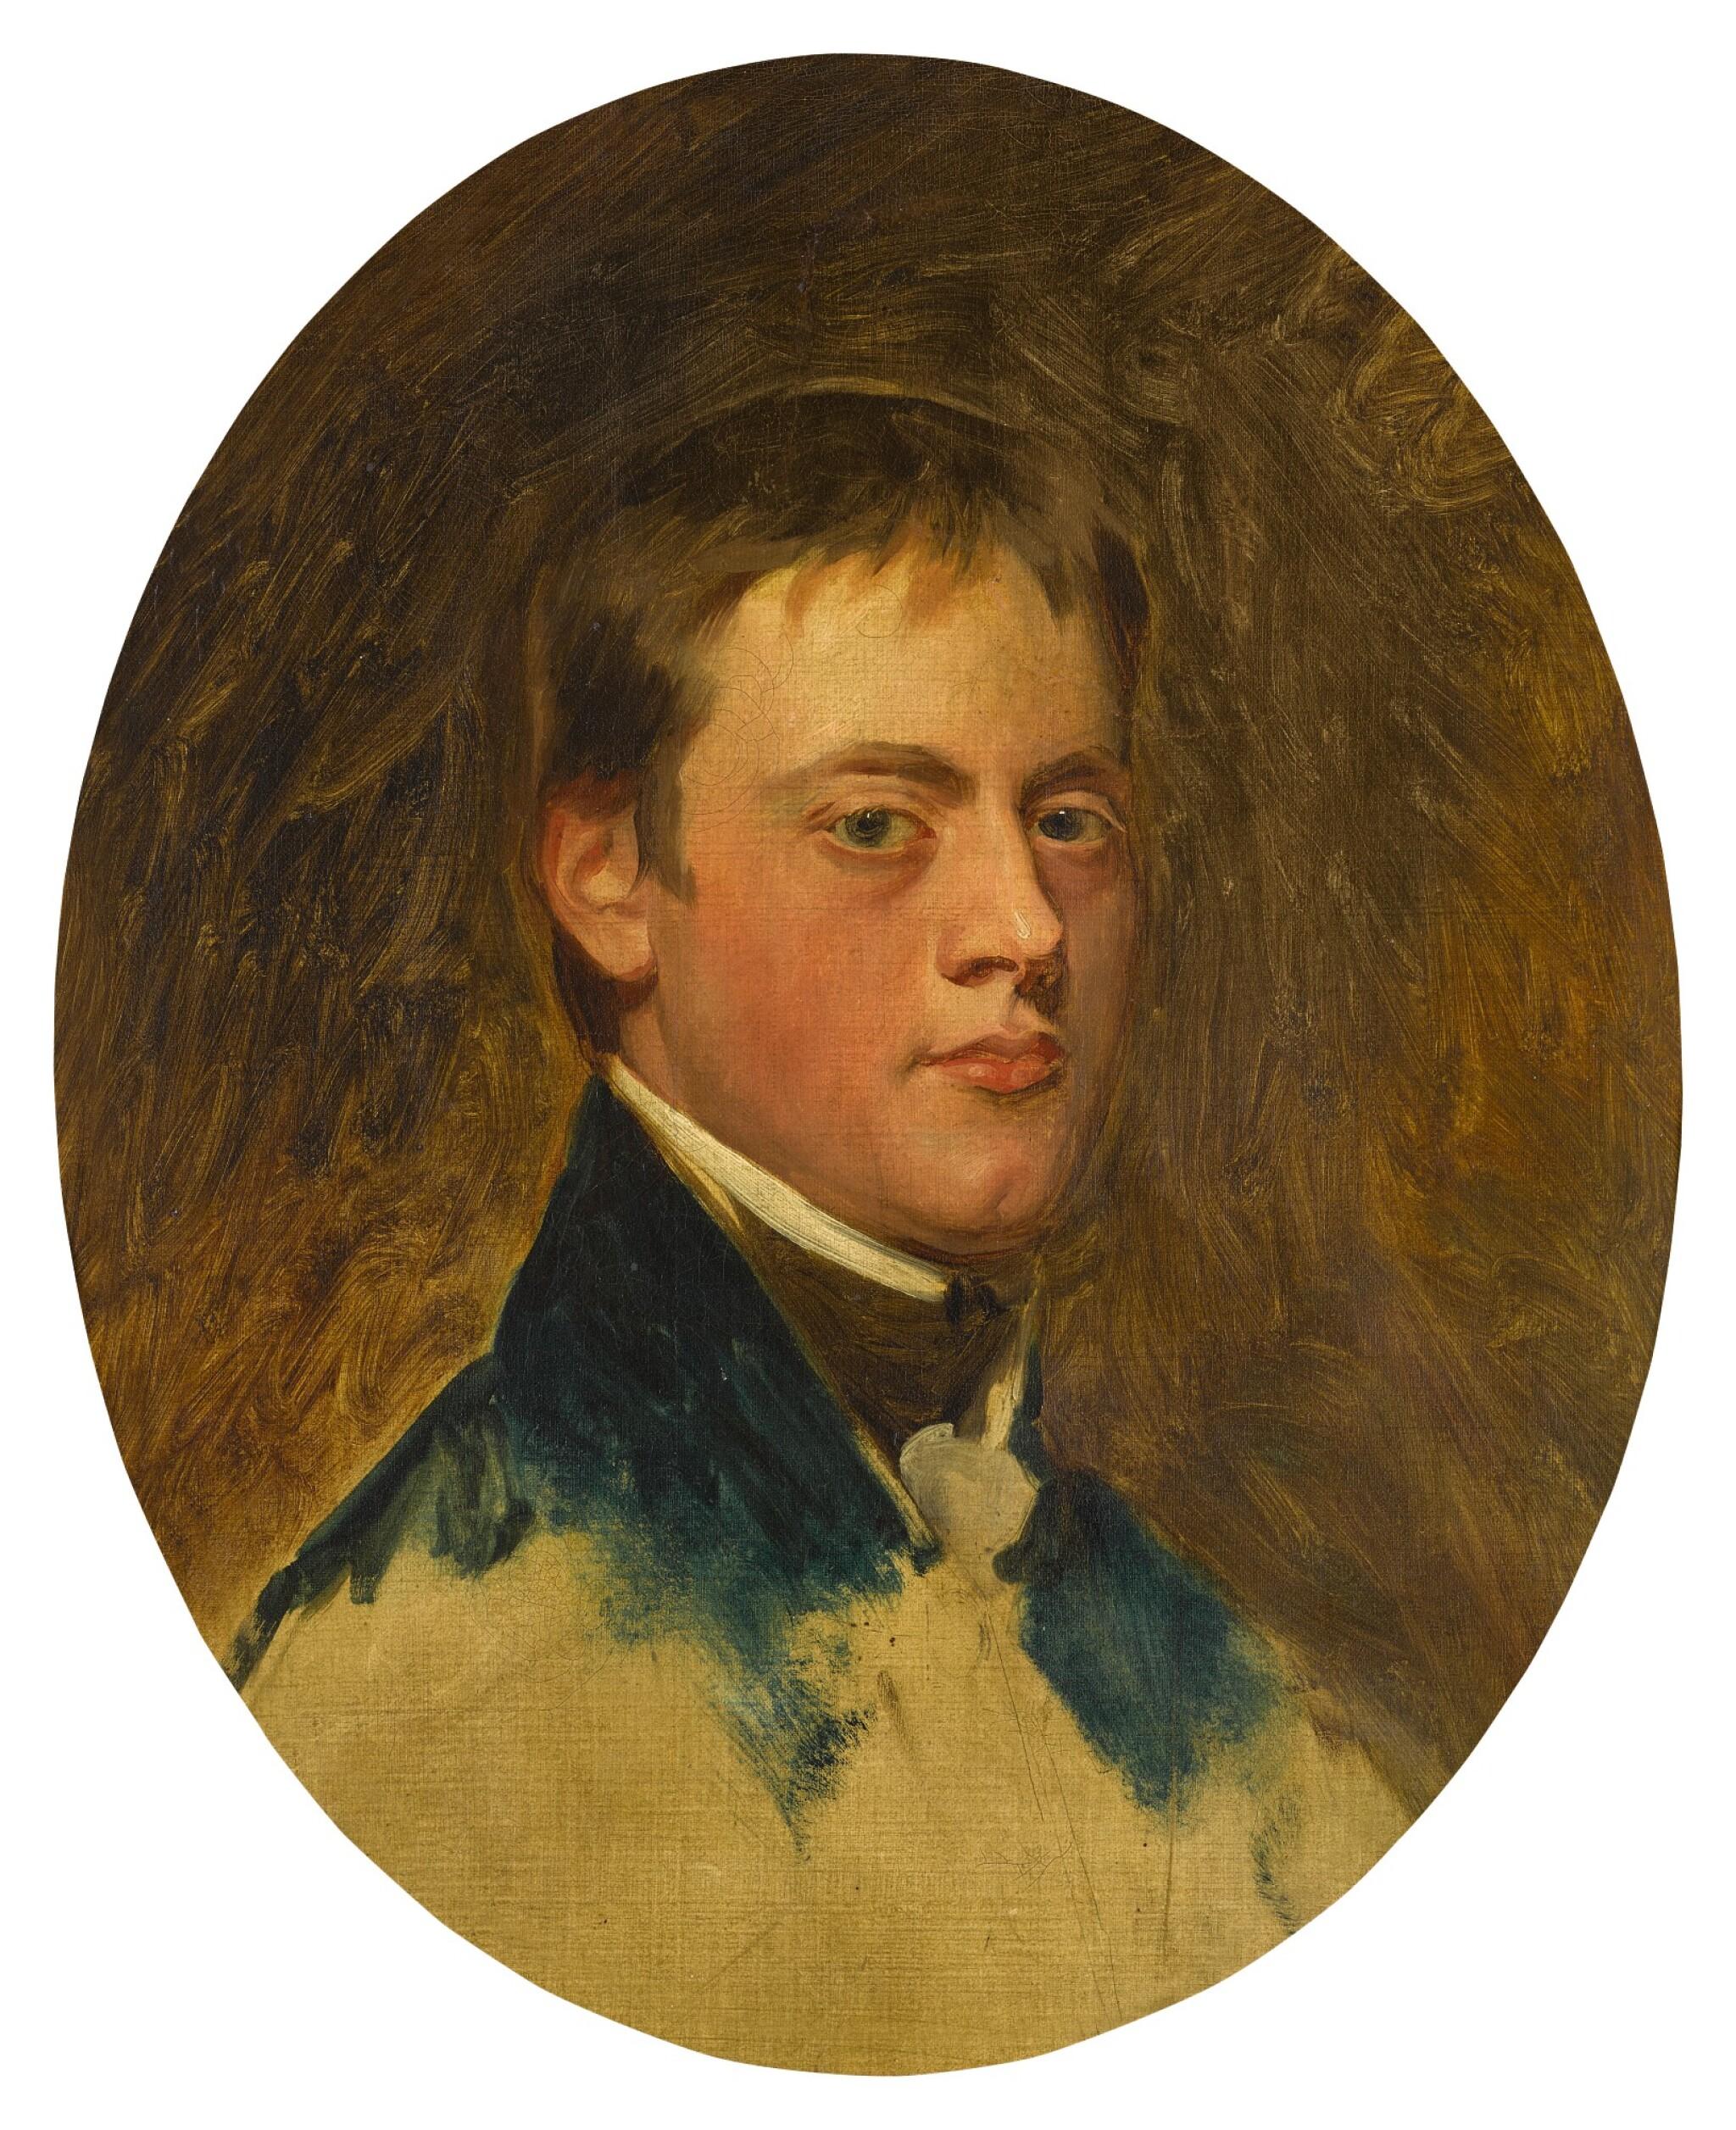 View full screen - View 1 of Lot 172. Portrait study of Norton Joseph Knatchbull (1783-1801), bust-length, wearing a blue coat.